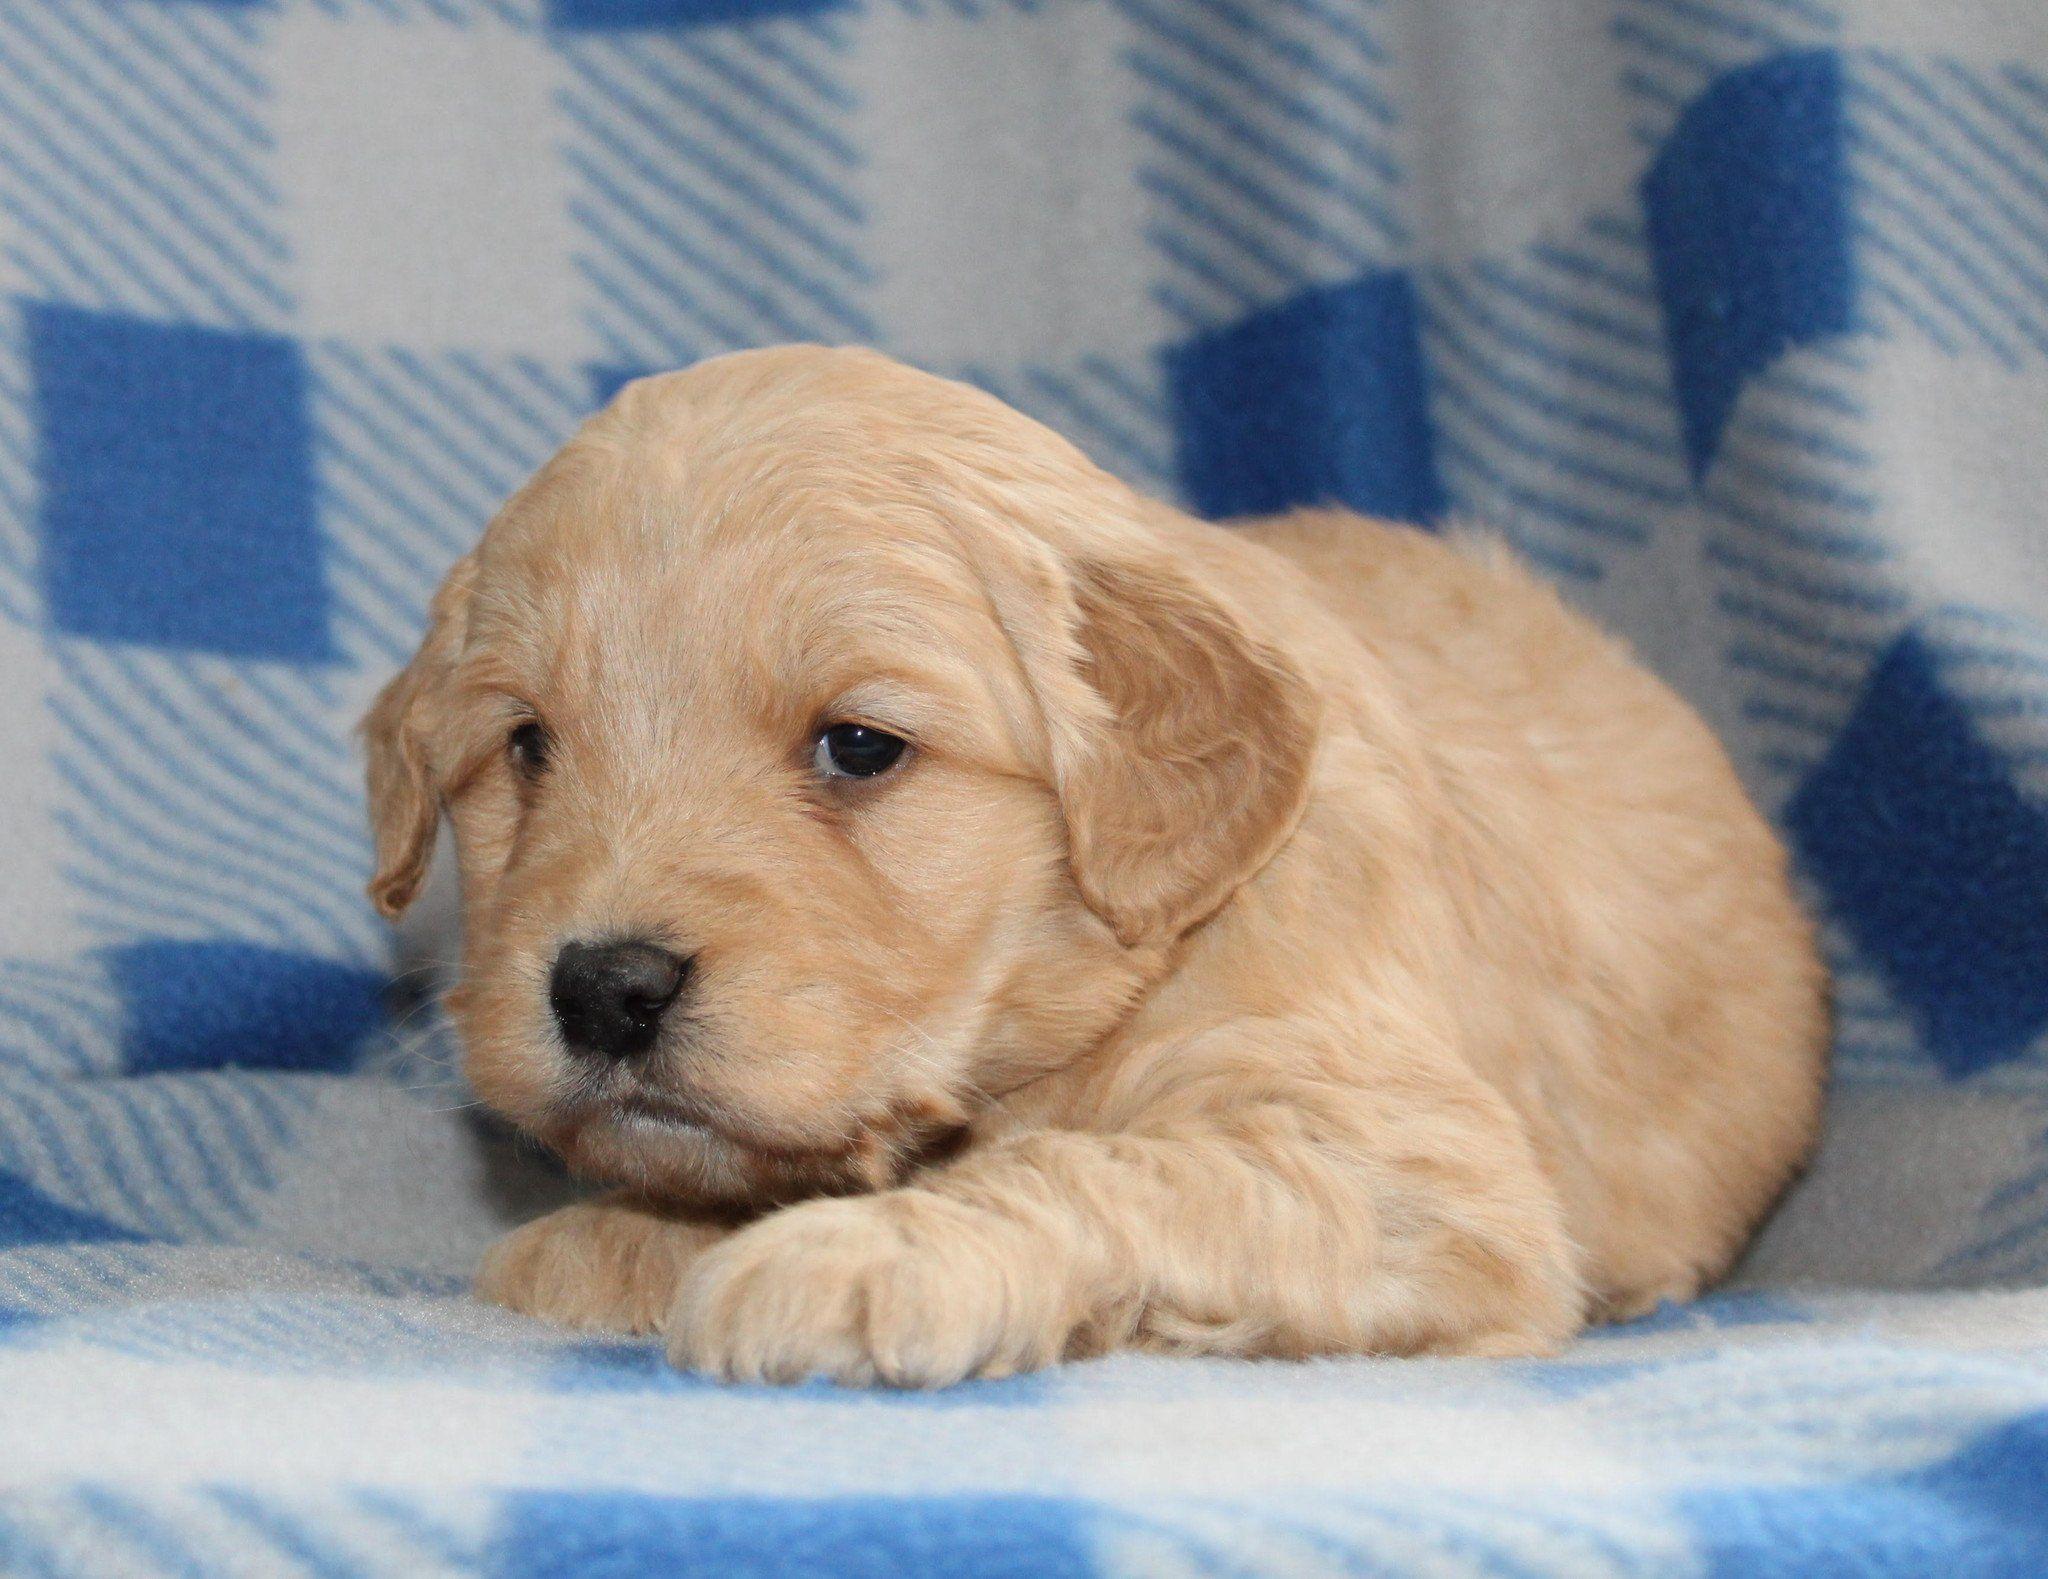 Miles Male Mini Goldendoodle Puppy Goldendoodle Puppy Mini Goldendoodle Puppies Miniature Goldendoodle Puppies